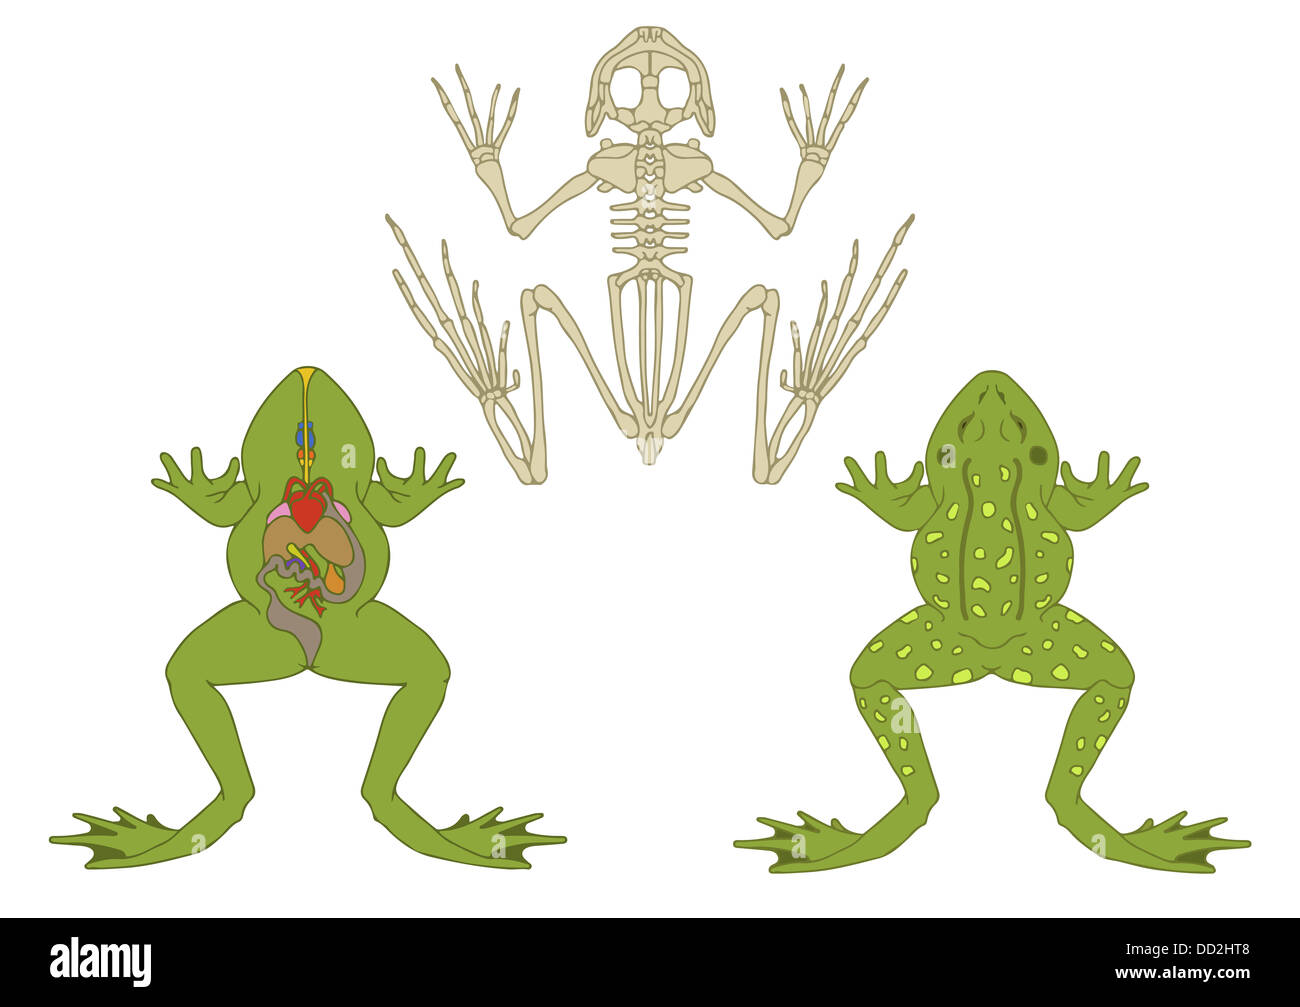 Frog Skeleton Stock Photos & Frog Skeleton Stock Images - Alamy